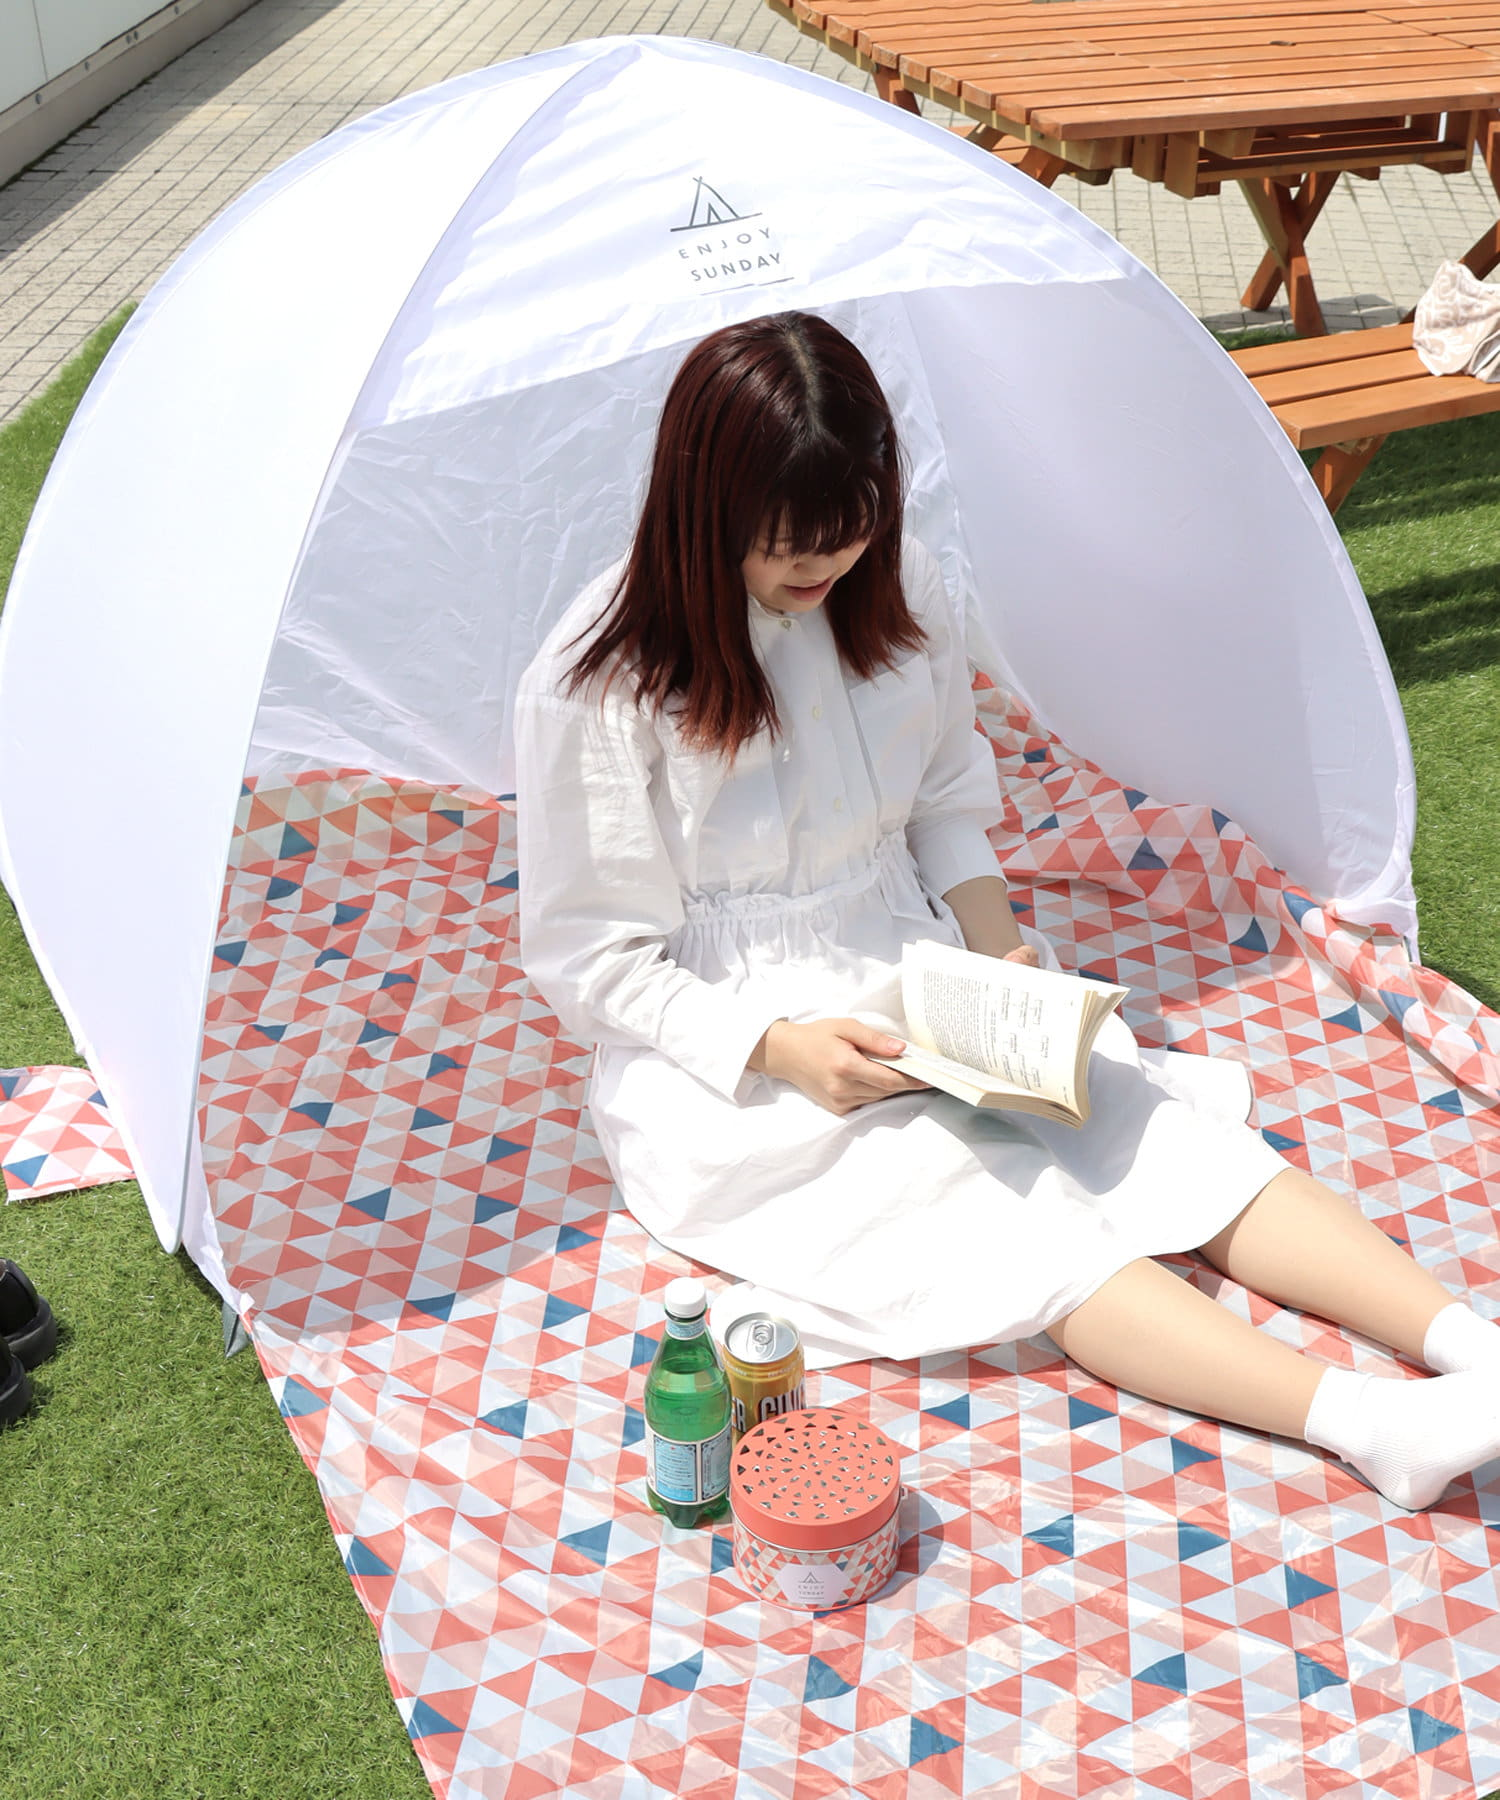 3COINS(スリーコインズ) 【GIRLY PICNIC】 POPUPテント